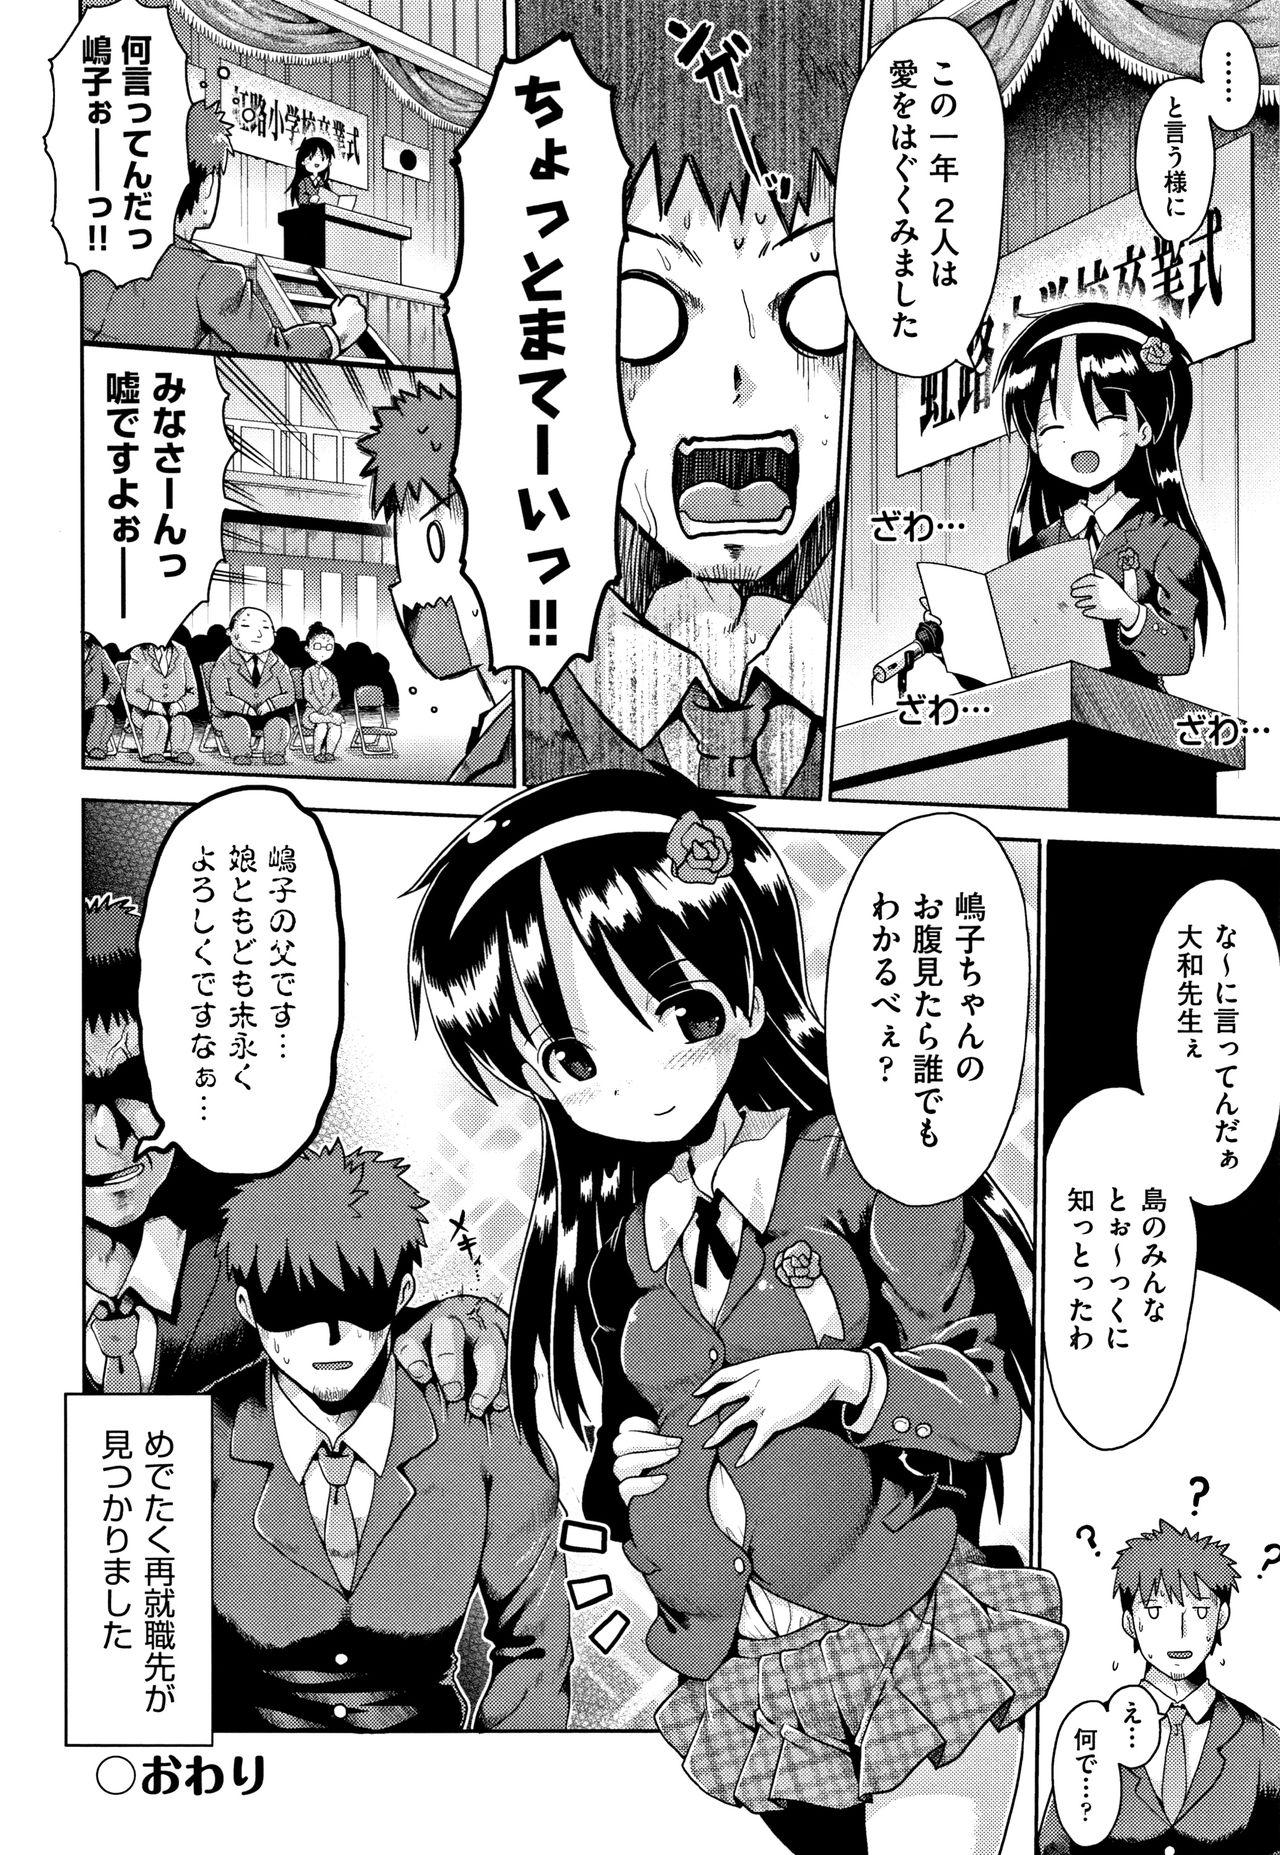 Kokugo Sansuu Rika Sex 118